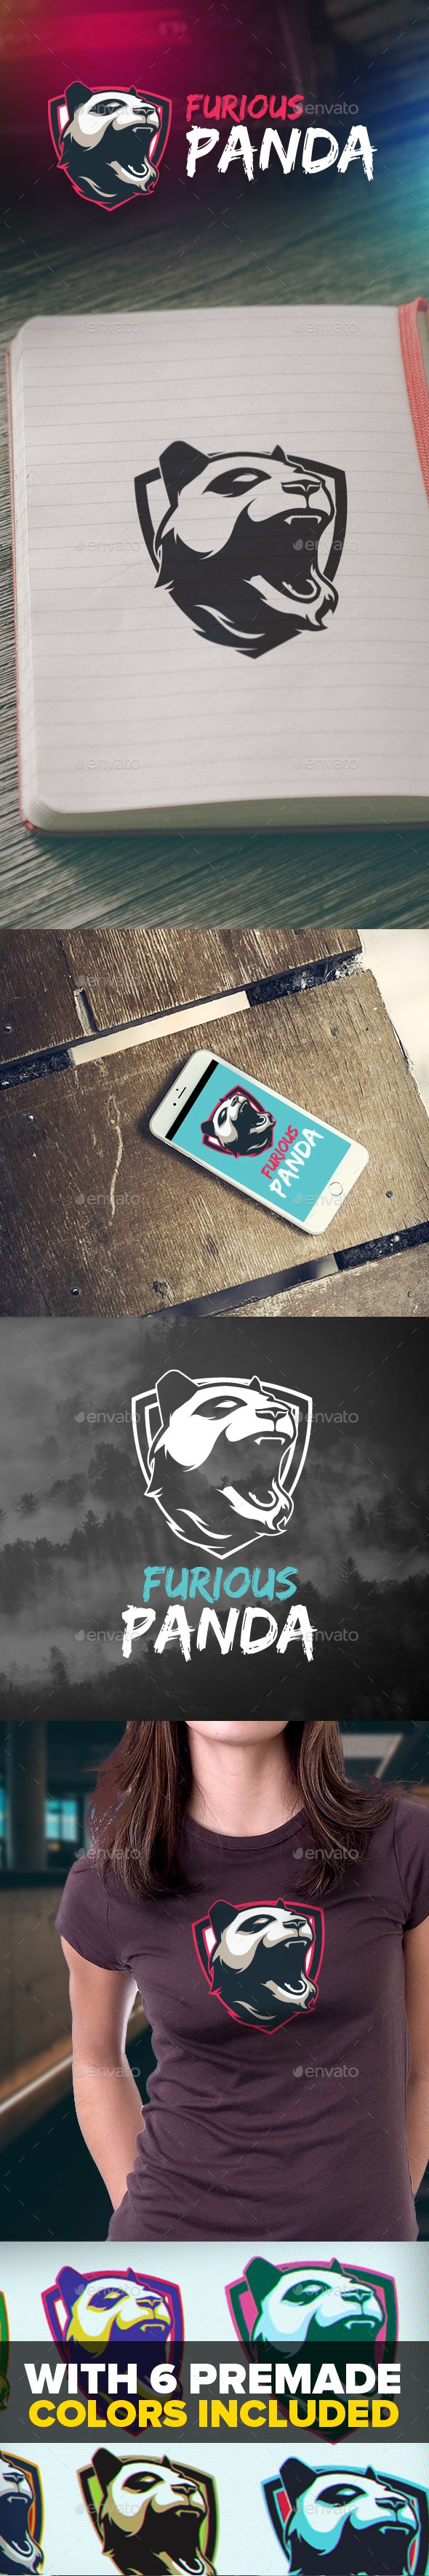 Furious Panda  Logo Design Template Vector #logotype Download it here: http://graphicriver.net/item/furious-panda-logo/15431468?s_rank=906?ref=nexion